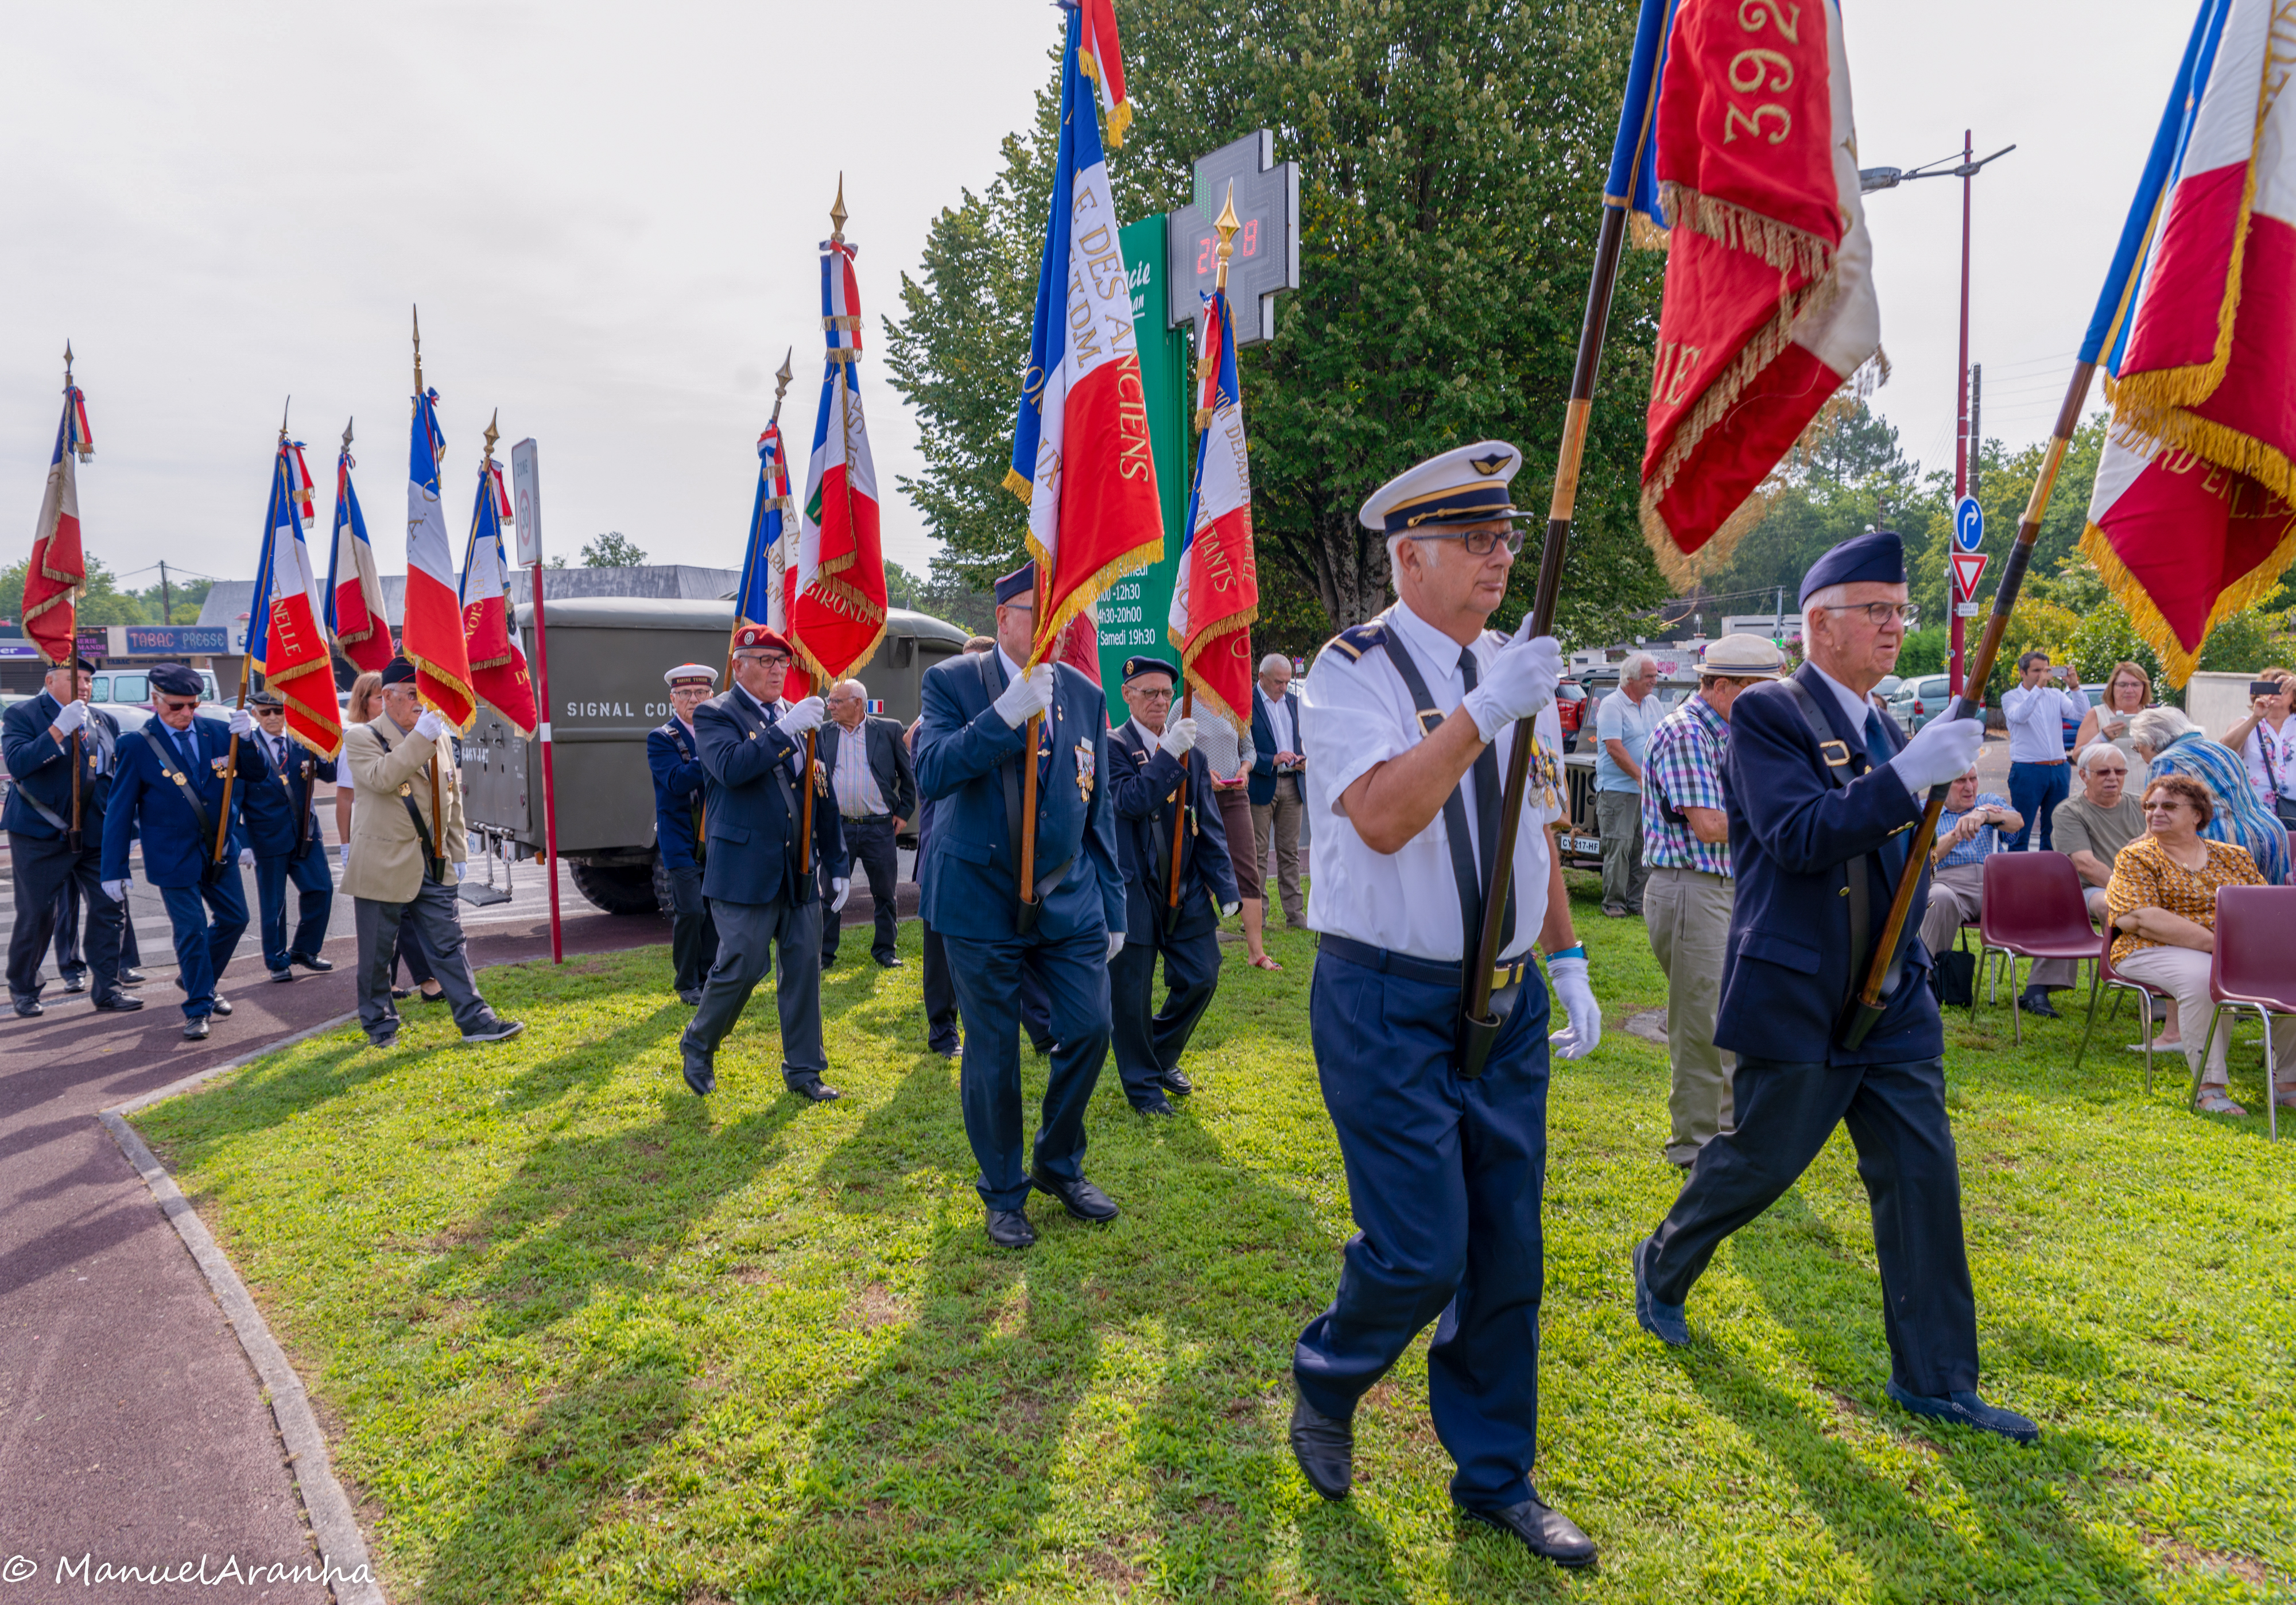 COMMEMORATION DU CAMP DE GERMIGNAN F26